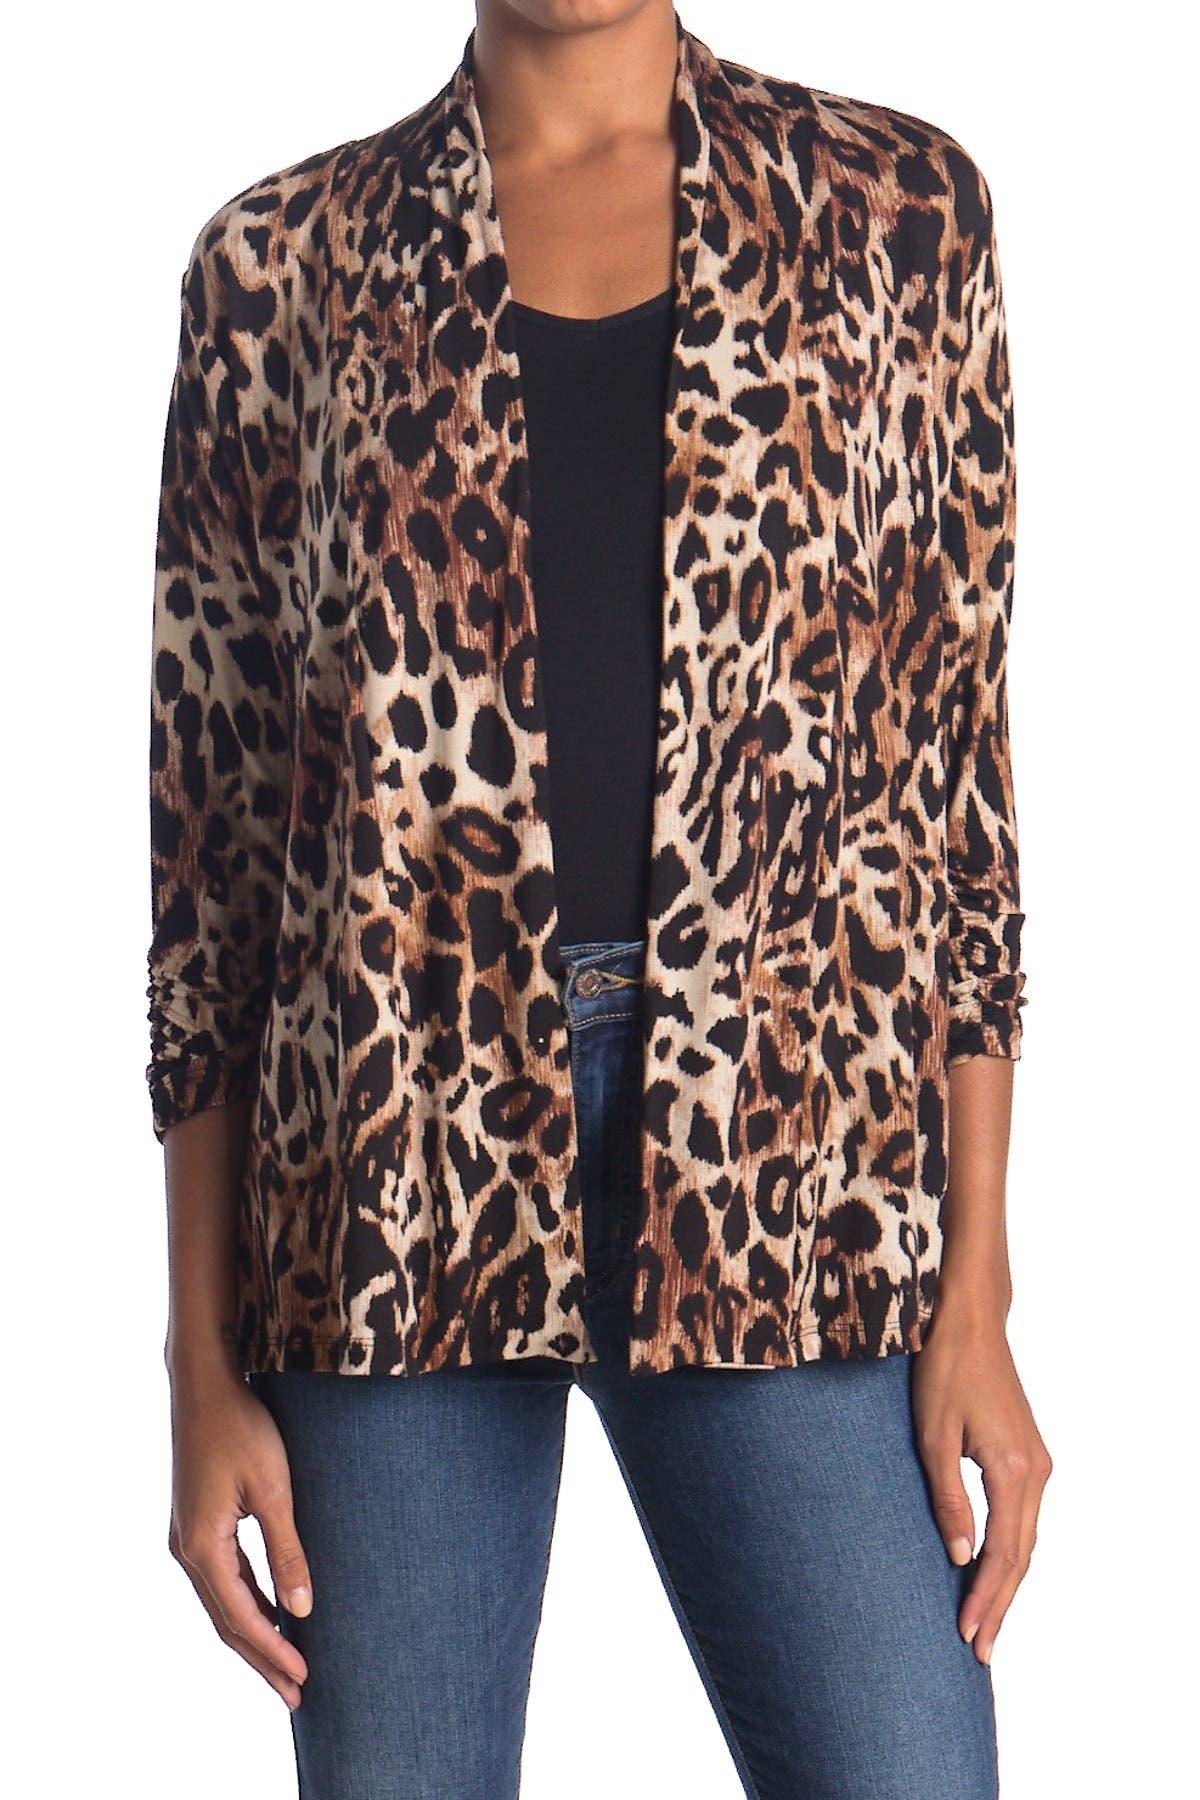 Image of Bobeau Leopard Knit Cardigan